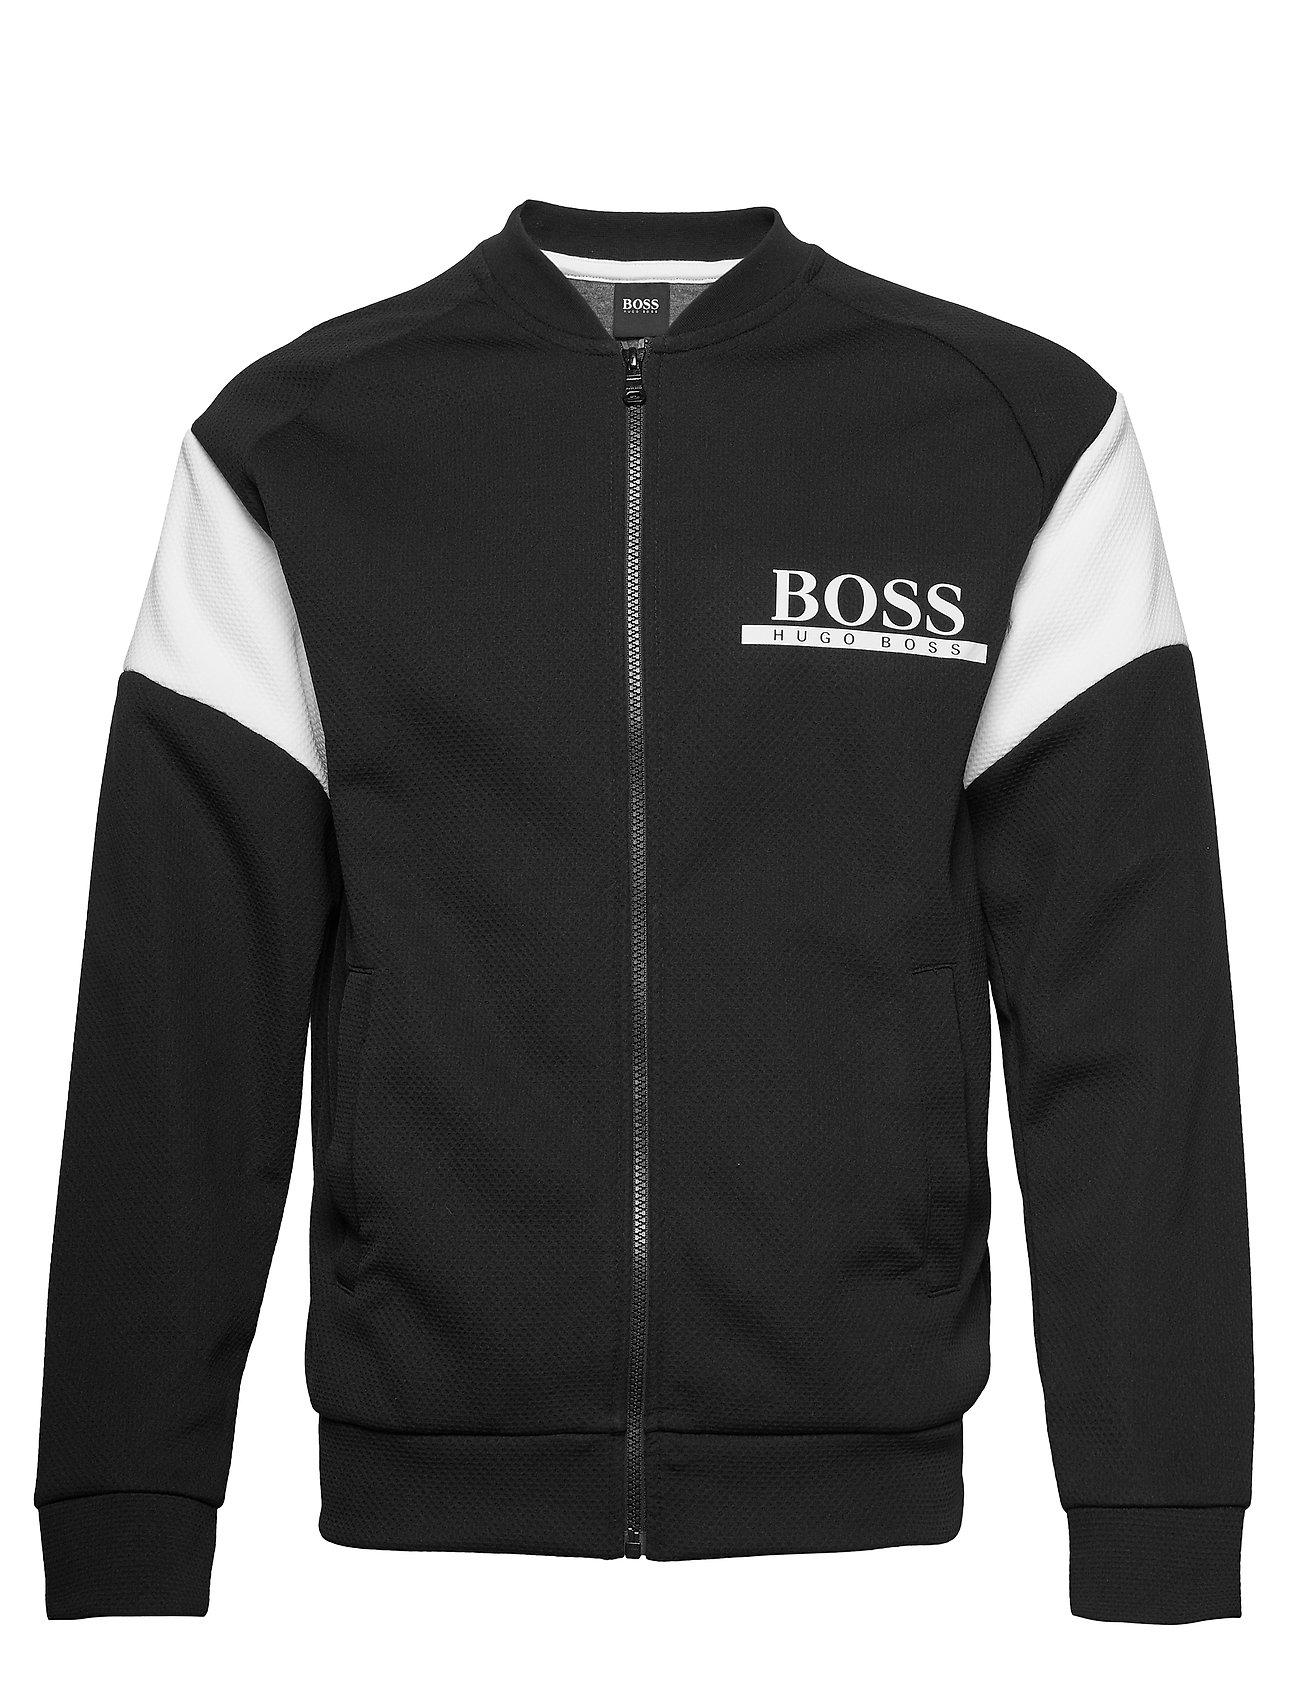 BOSS Business Wear Fashion College J. - BLACK